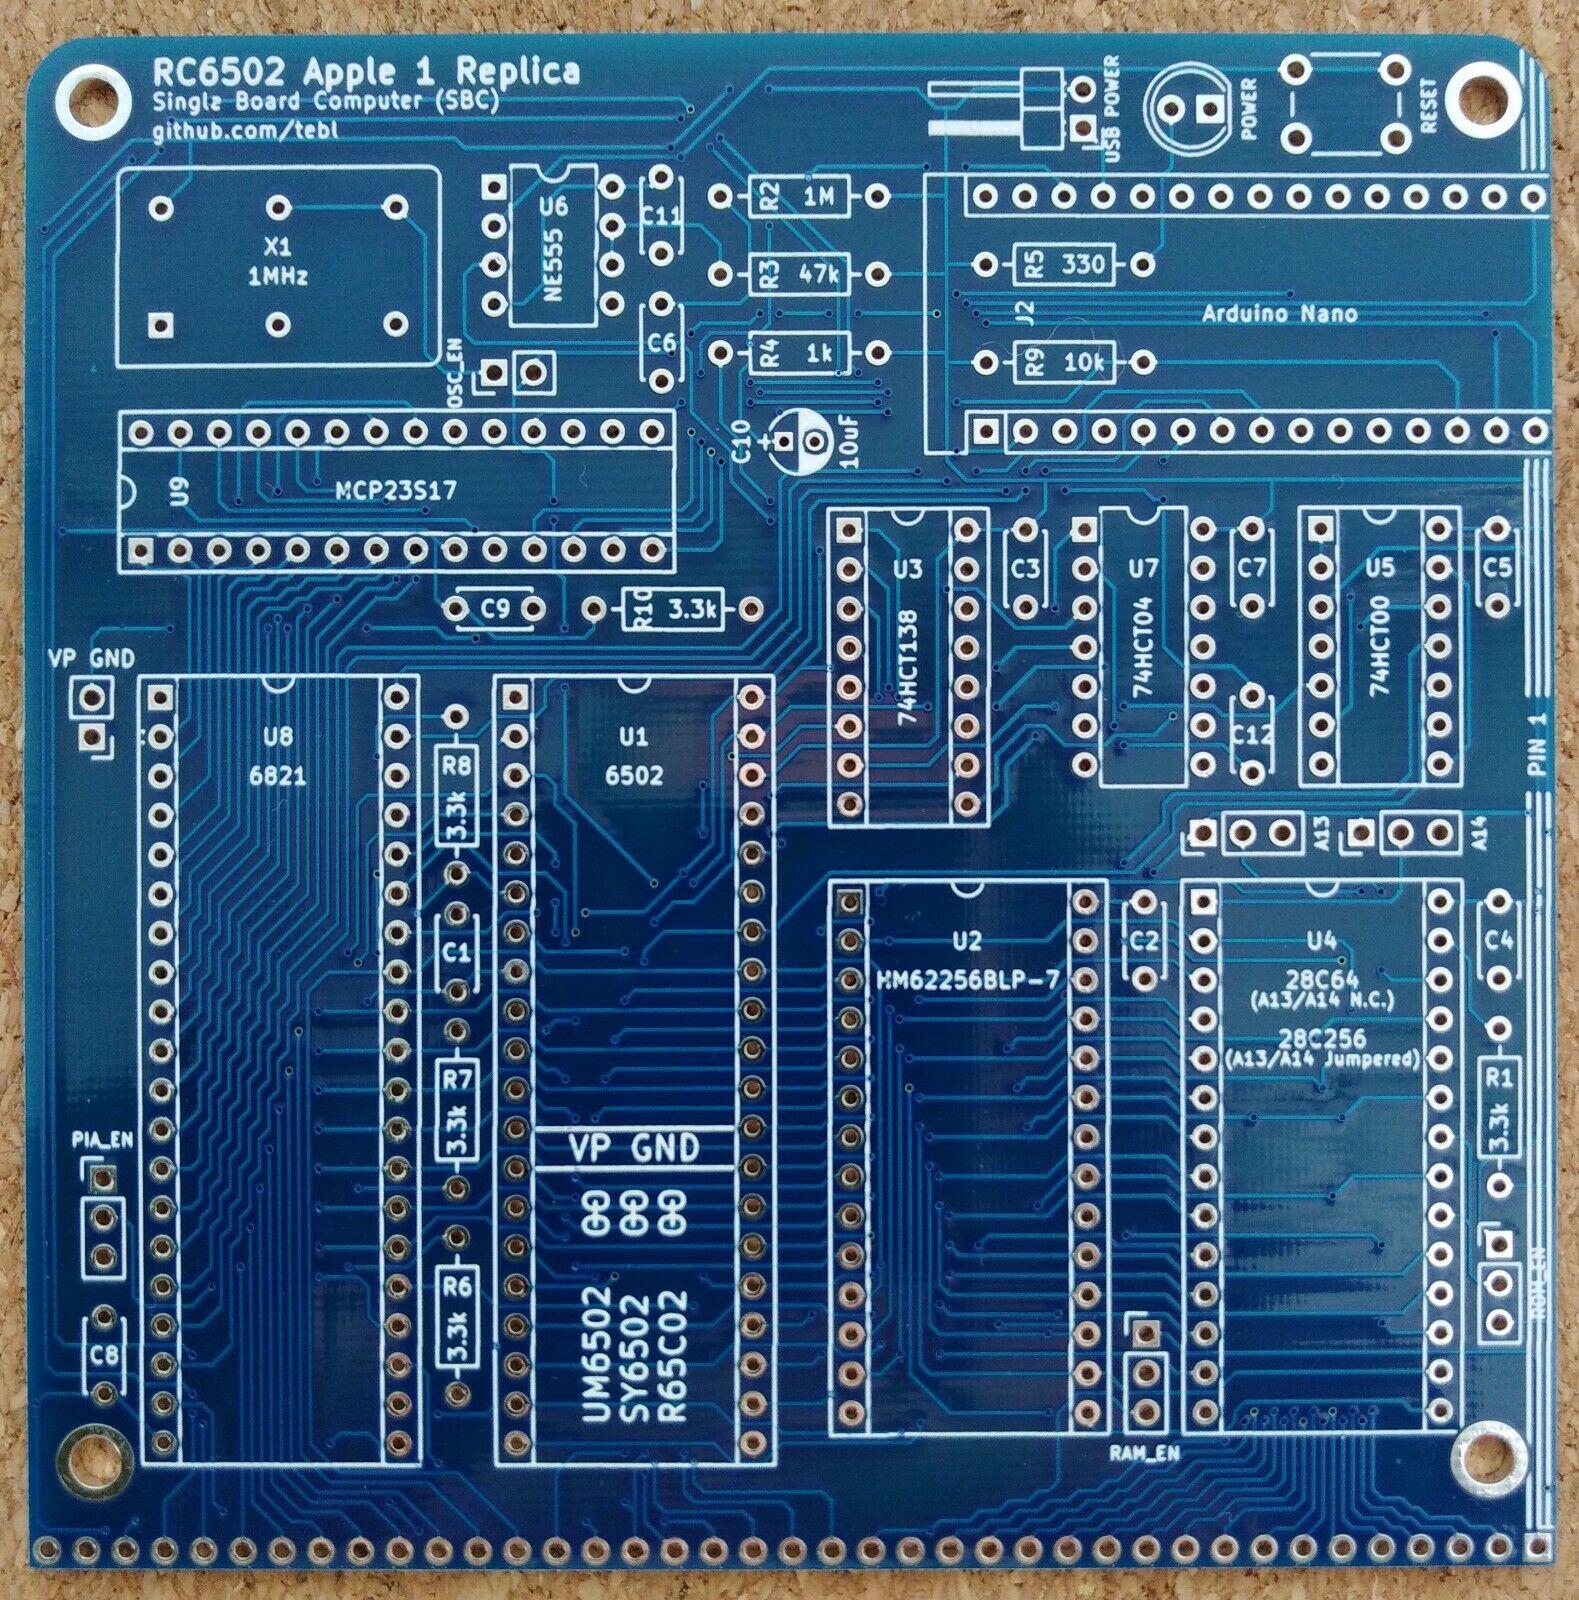 |RC6502 Rev H Apple 1 Replica PCB